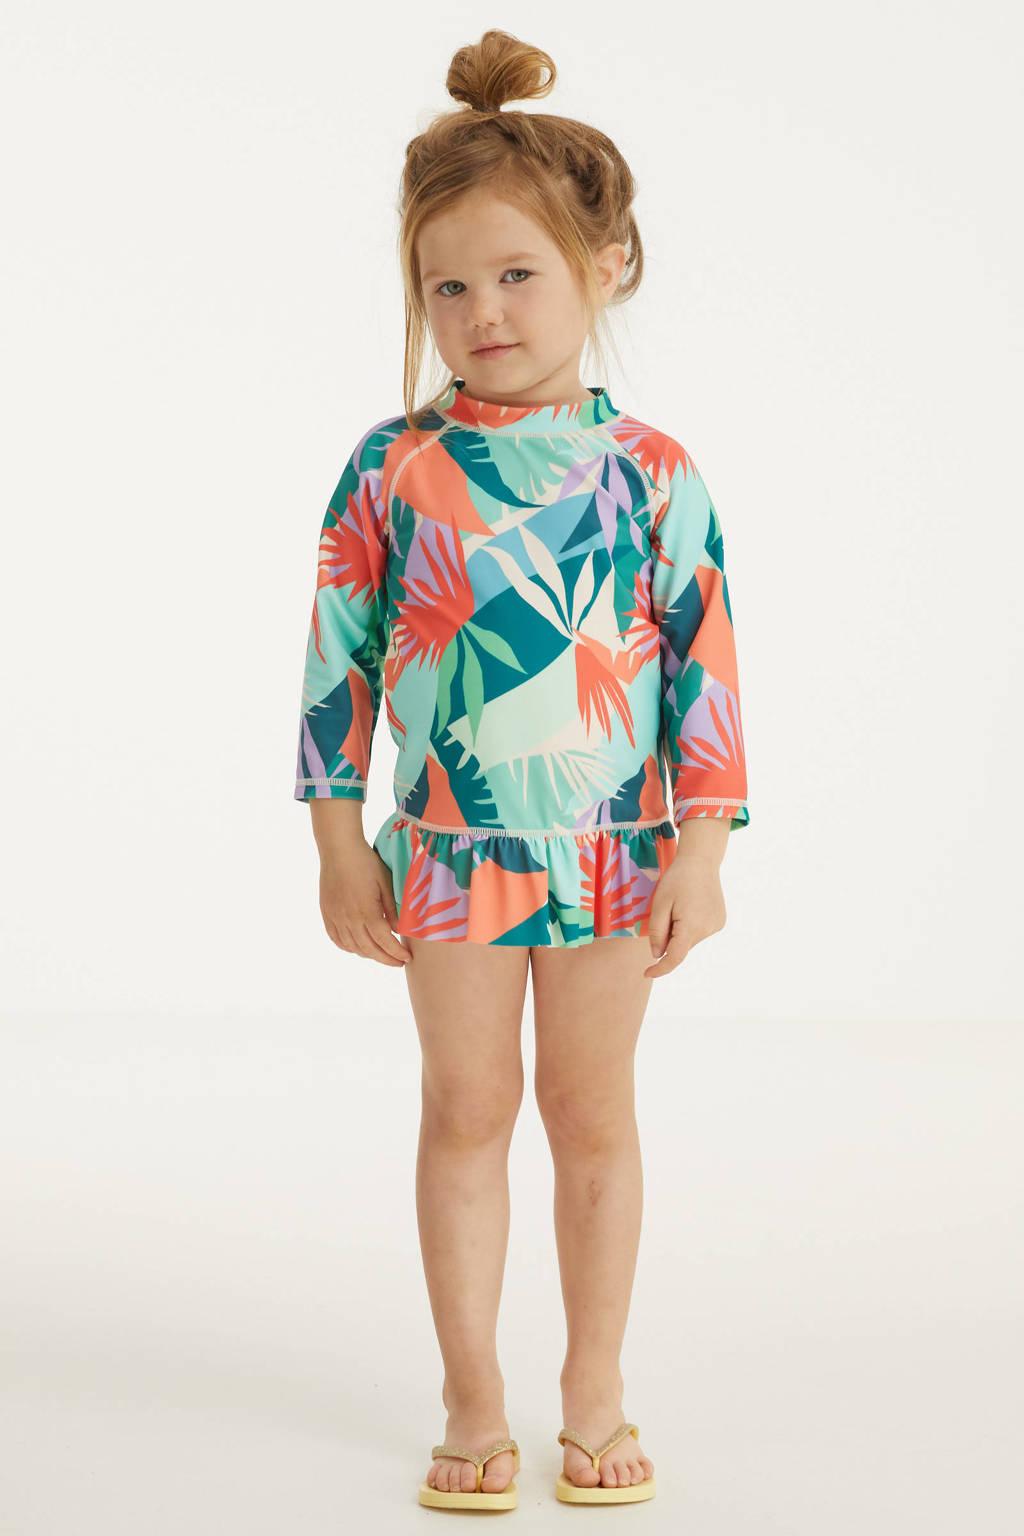 BEACHWAVE baby crop bikini + UV 50+ top met all over print groen/oranje, Groen/oranje/ecru